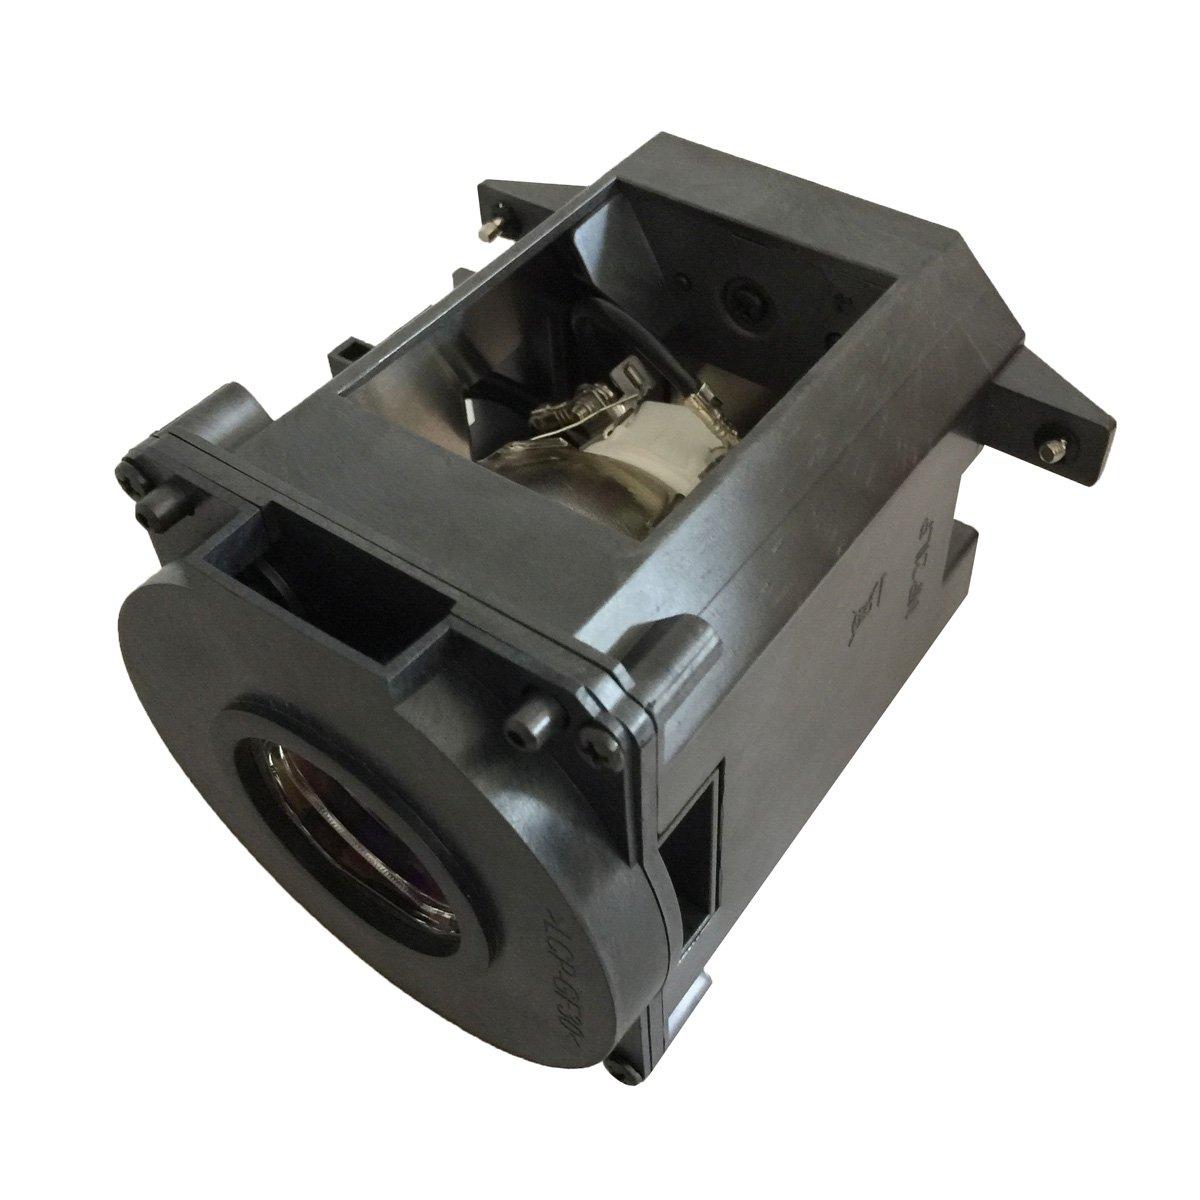 EachLight プロジェクター 交換用 ランプ NP21LP(互換性のあるランプ) NEC NP-PA600XJL、NP-PA550WJL、NP-PA500UJL、NP-PA500XJL13ZL、NP-PA550WJL13ZL対応(高品質ランプ)   B07FY8BVJR